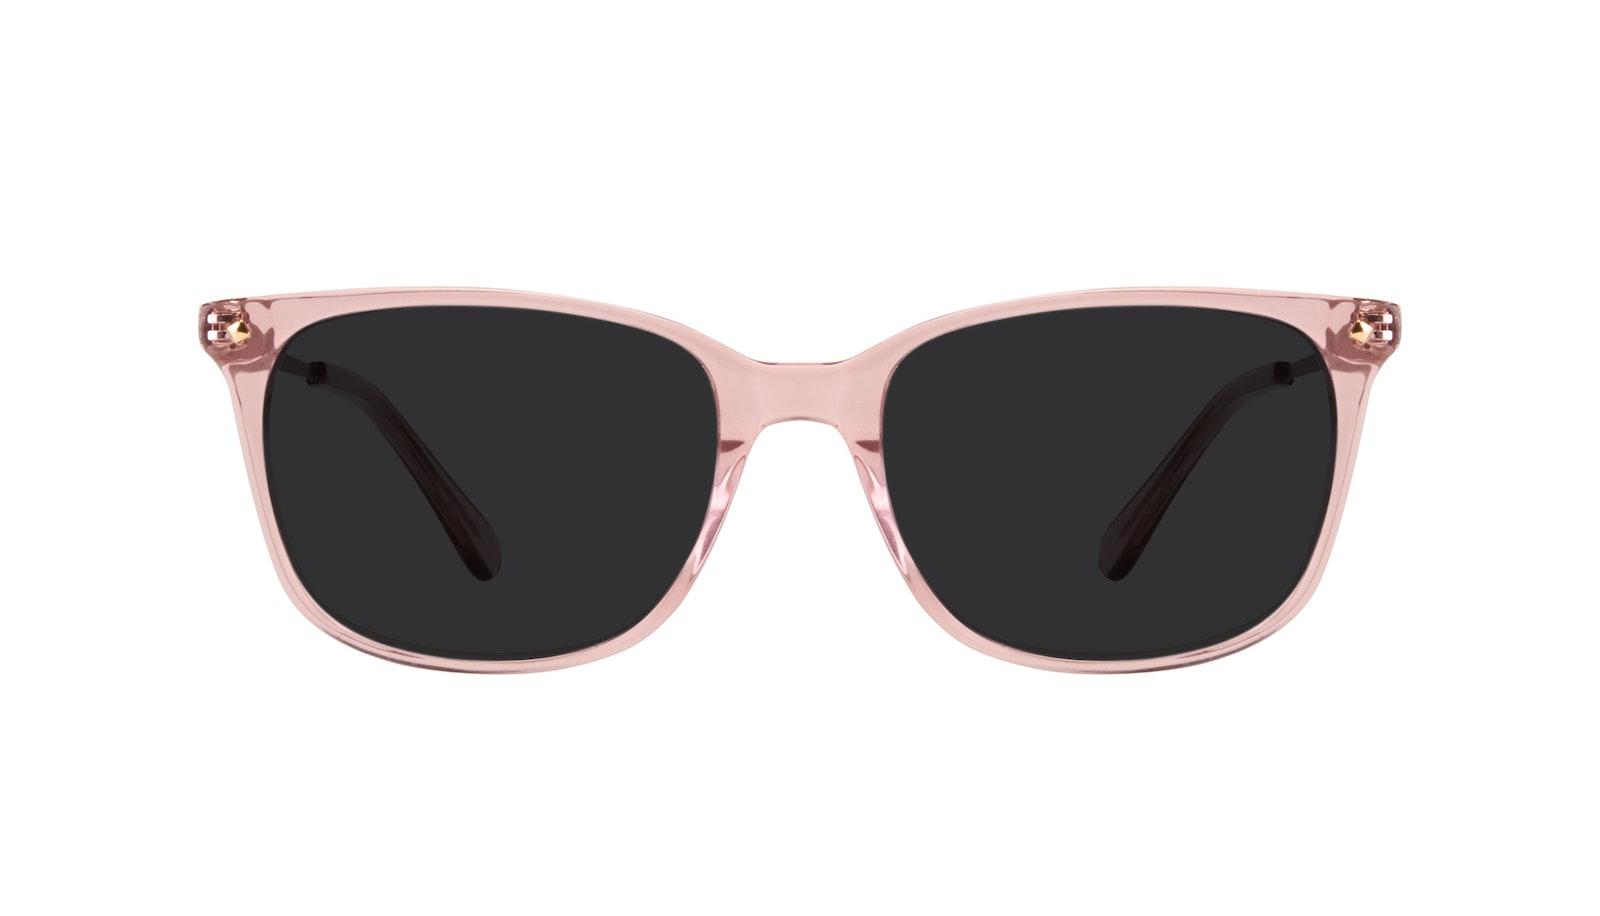 Affordable Fashion Glasses Rectangle Square Sunglasses Women Refine Rose